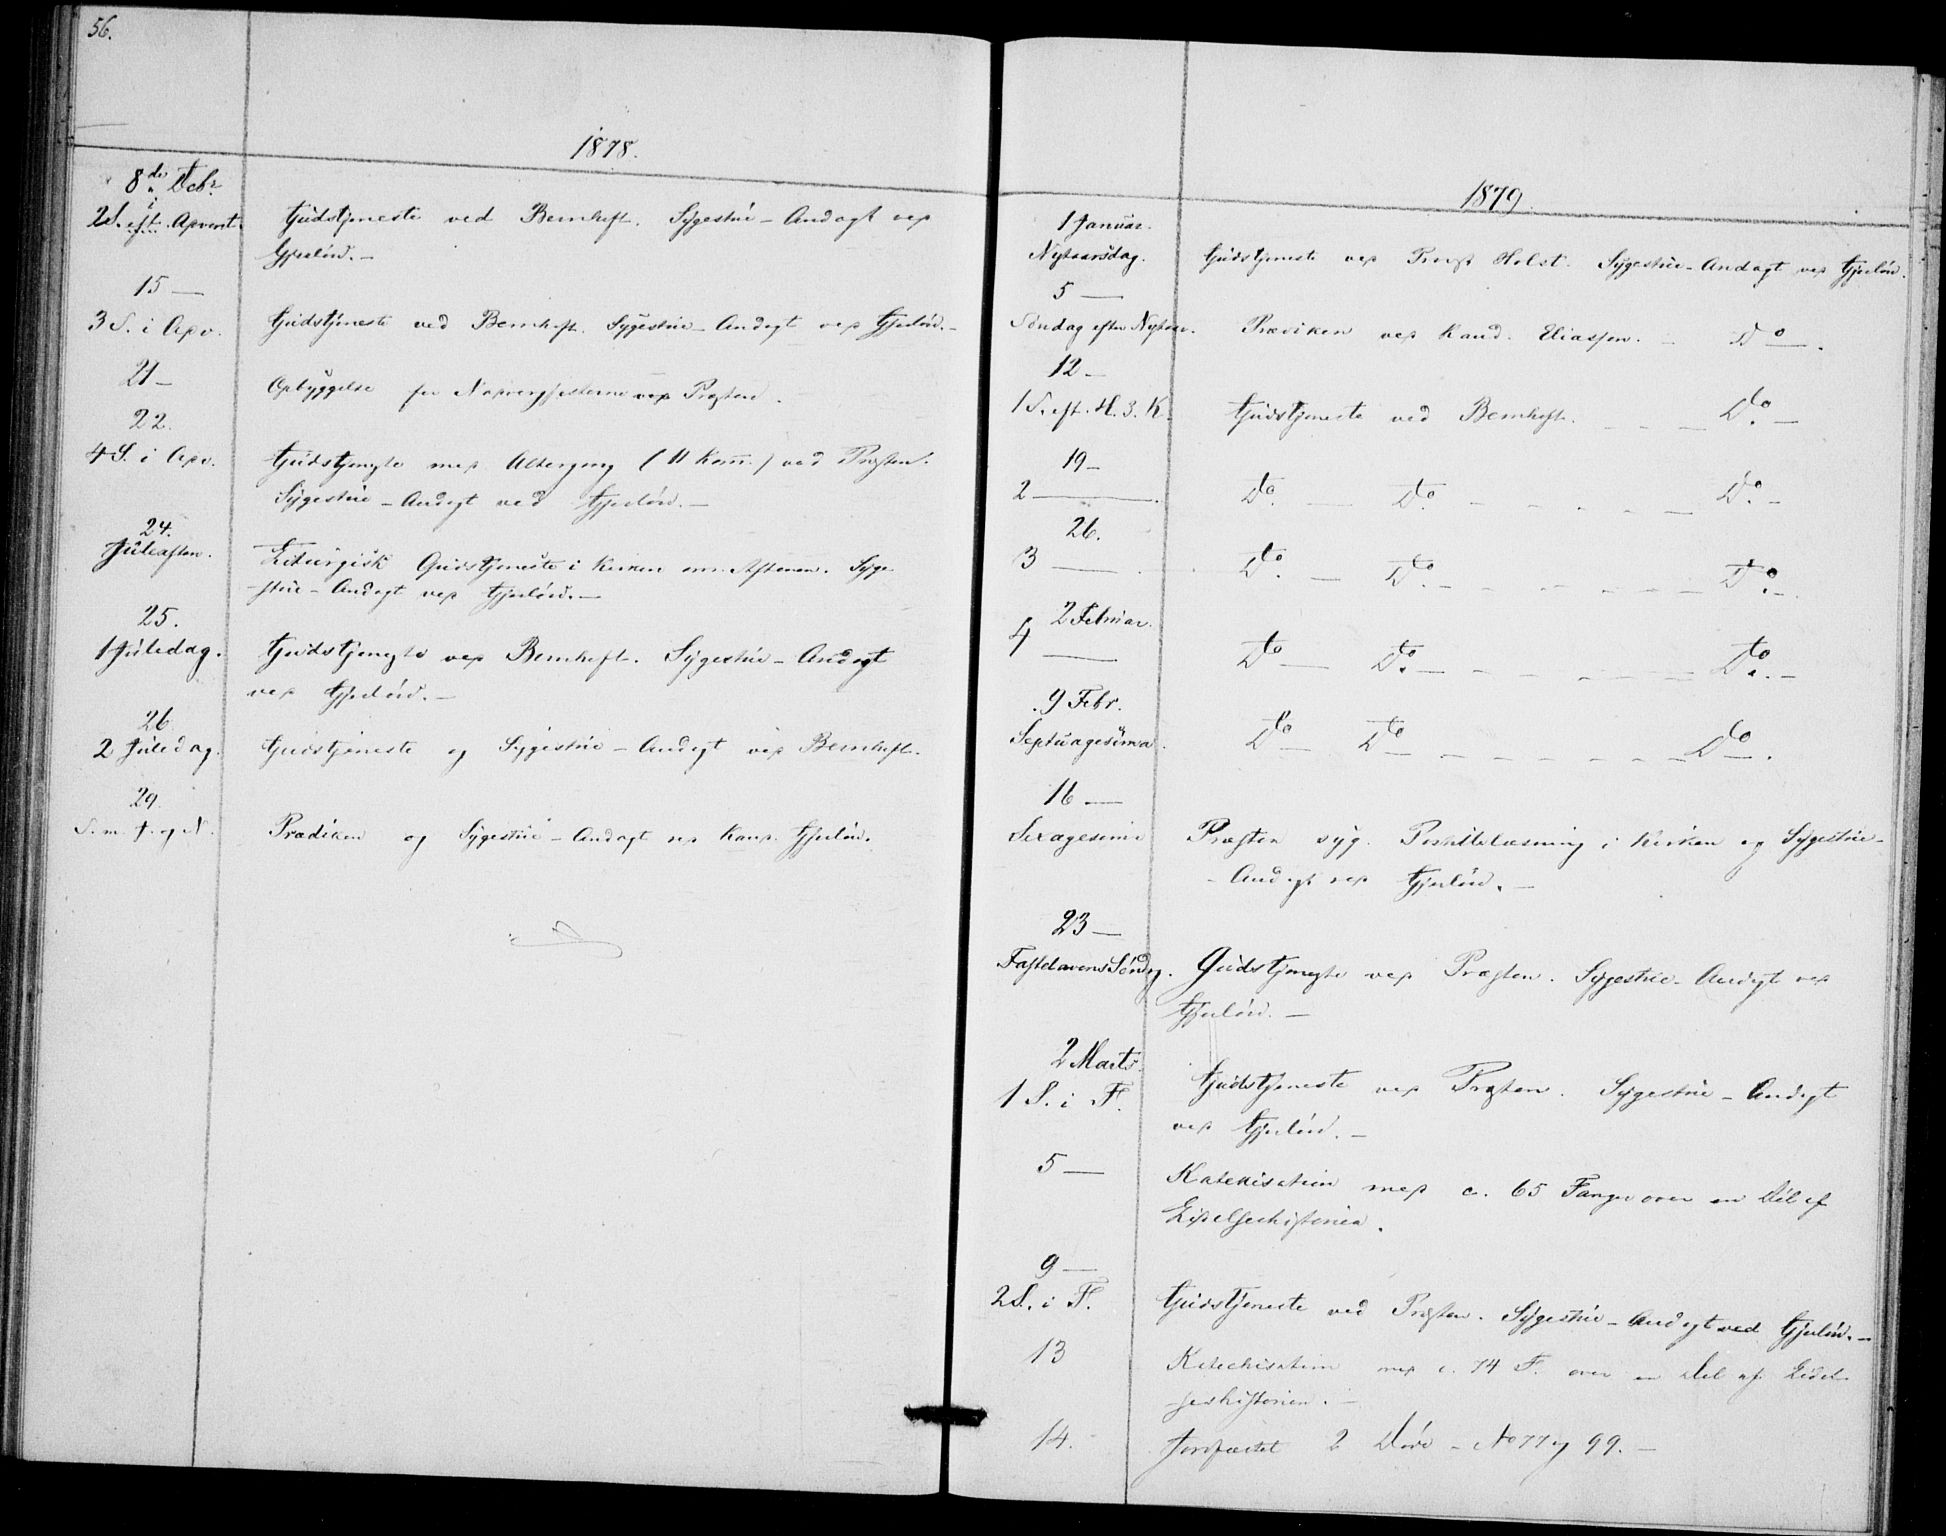 SAO, Akershus festnings slaveri Kirkebøker, F/Fa/L0002: Ministerialbok nr. 2, 1852-1883, s. 56